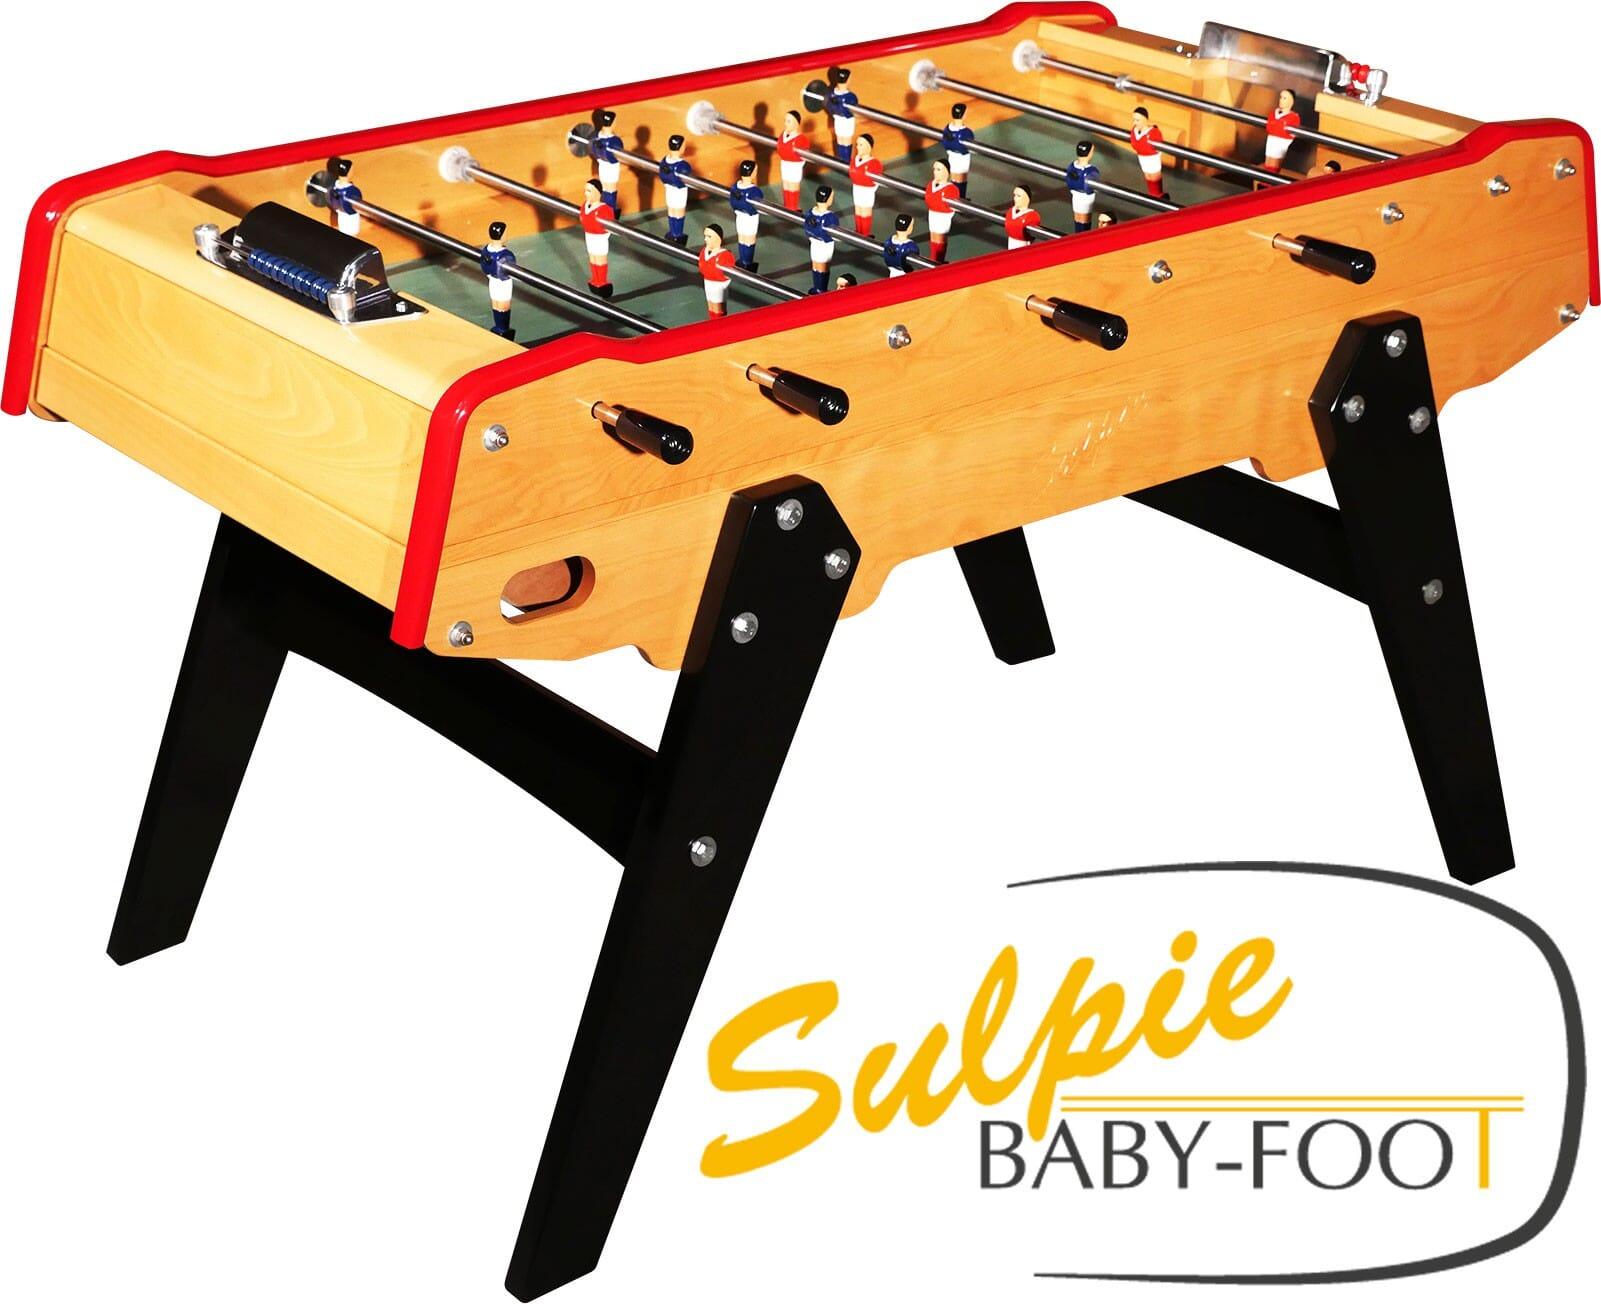 baby foot sulpie outsider babyfoot vintage. Black Bedroom Furniture Sets. Home Design Ideas